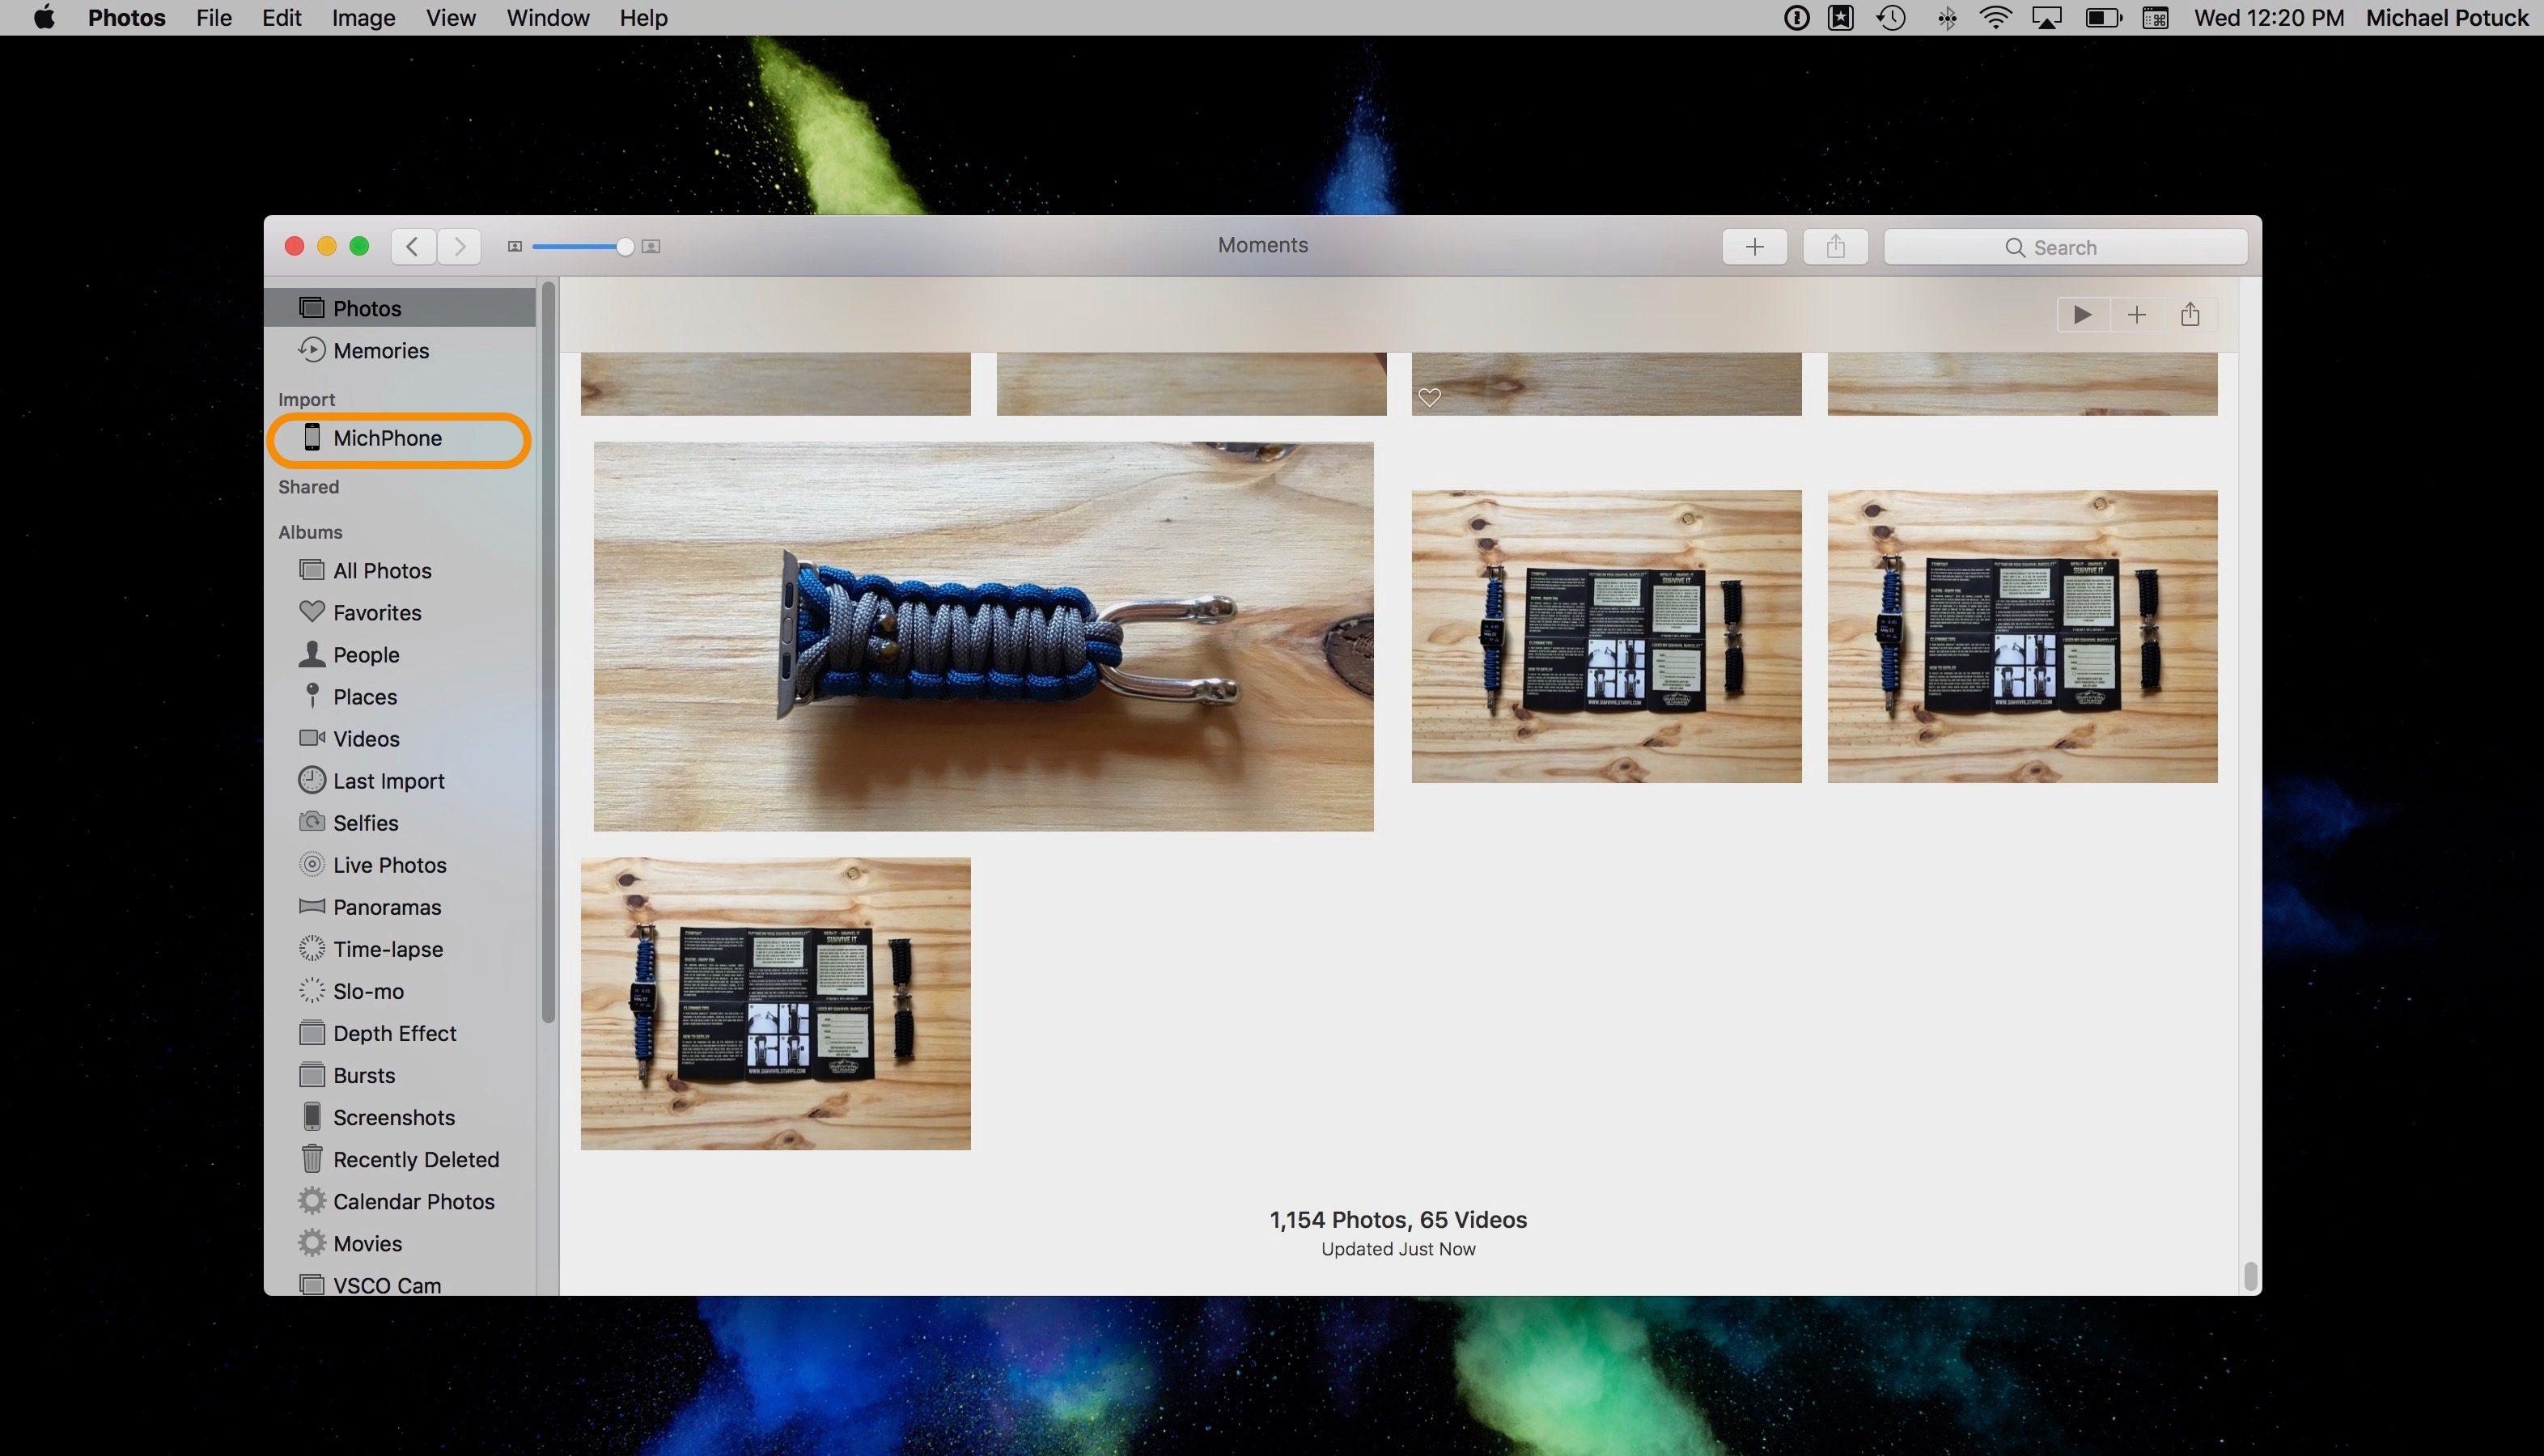 "<span href=""https://9to5mac.com/2017/05/11/how-to-import-videos-from-iphone-to-mac/"">Cómo importar vídeos desde el iPhone a Mac</a>"